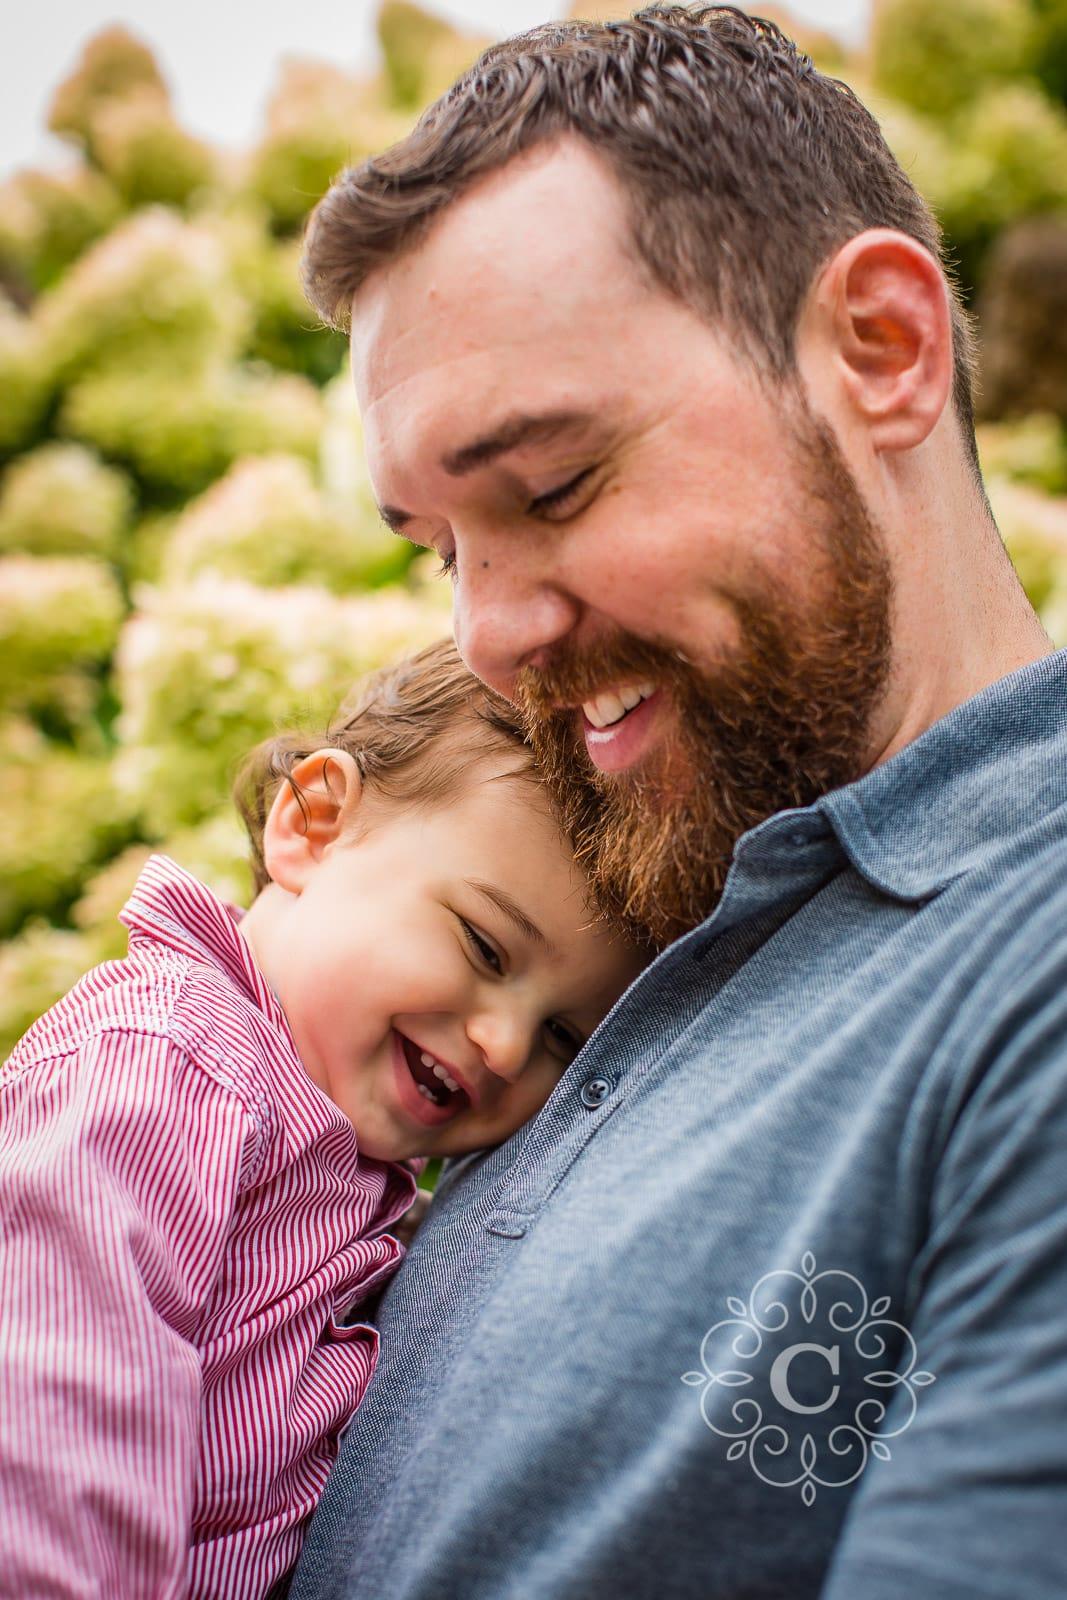 Minnesota Landscape Arboretum Family Photography